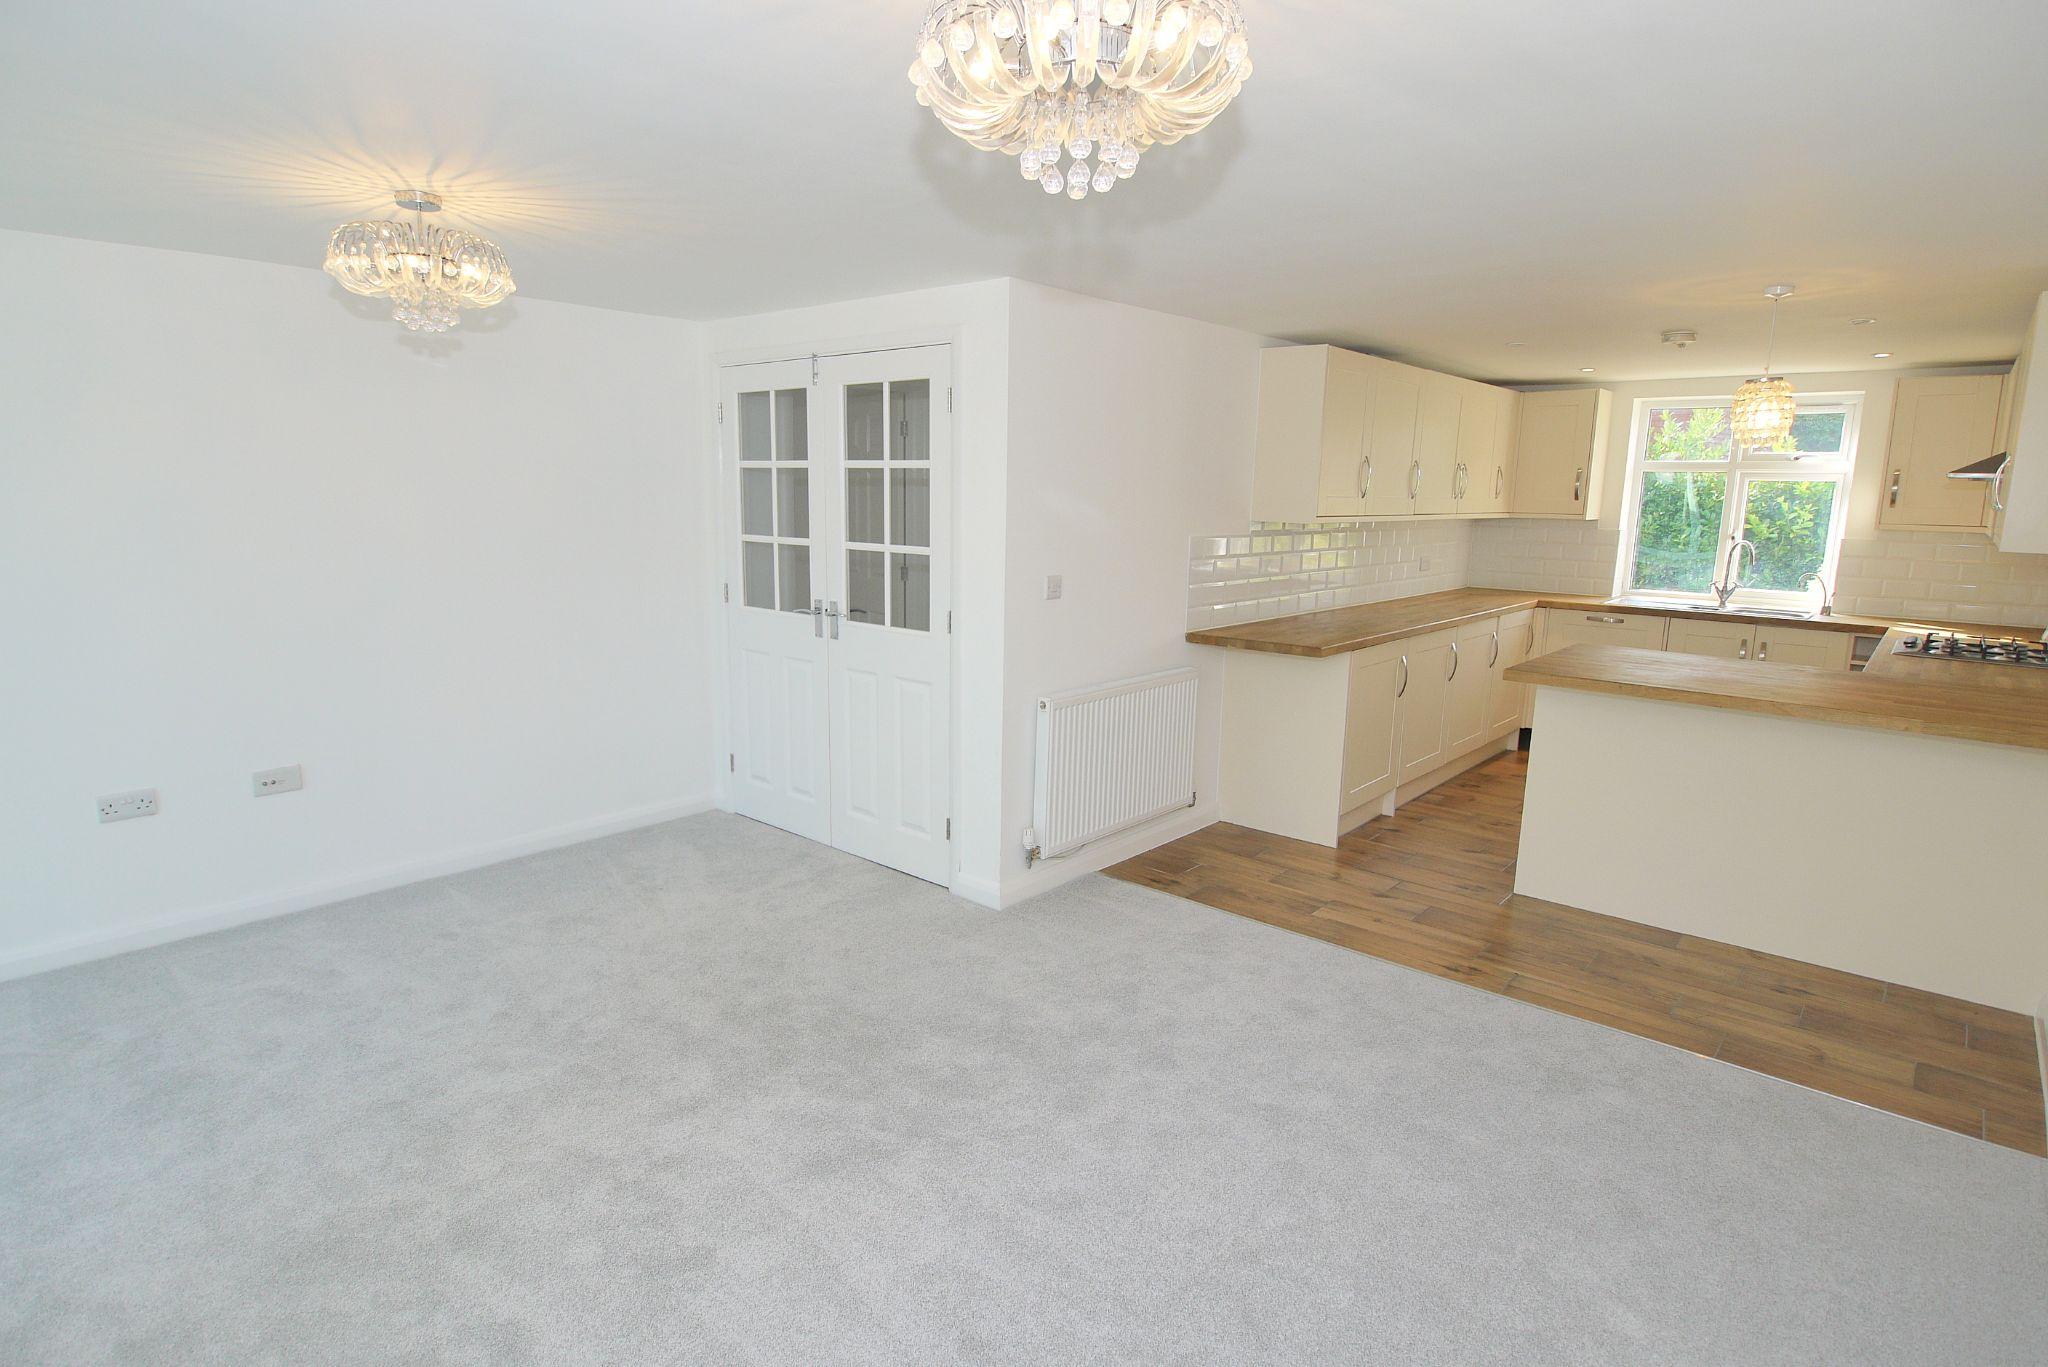 3 bedroom detached house Sold in Sevenoaks - Photograph 2